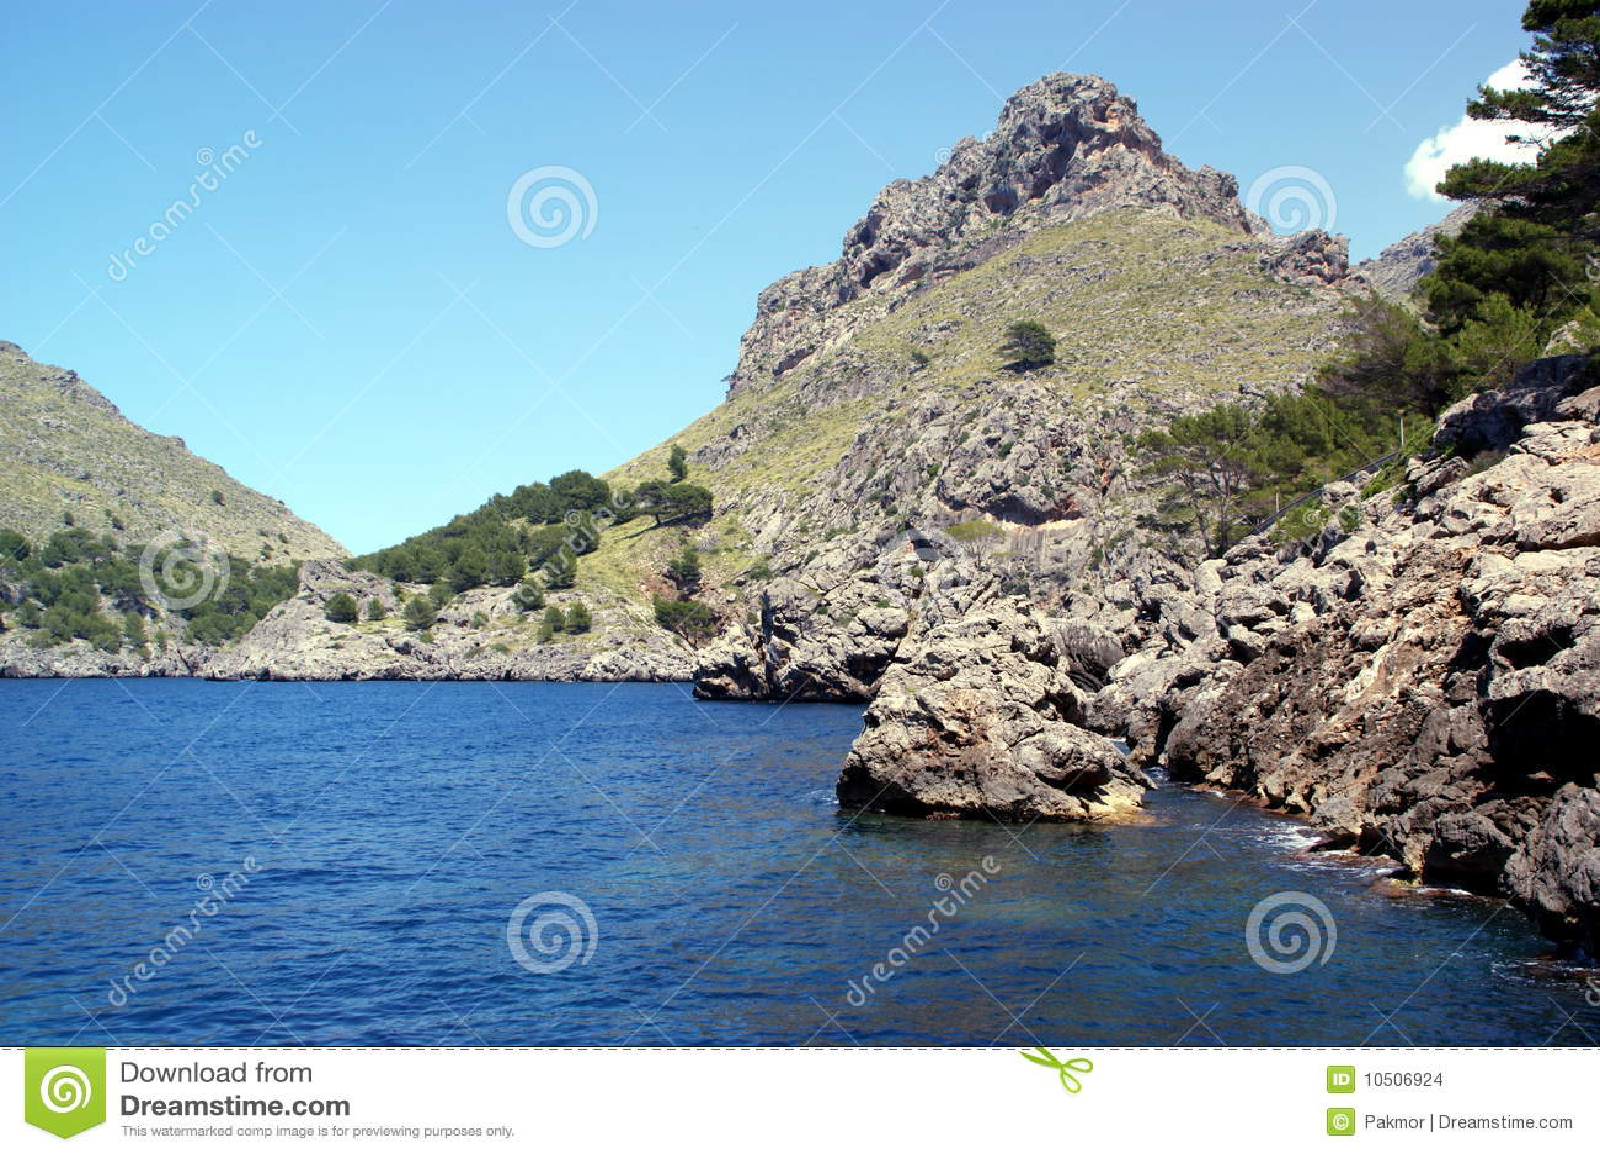 Time In Balearic Islands